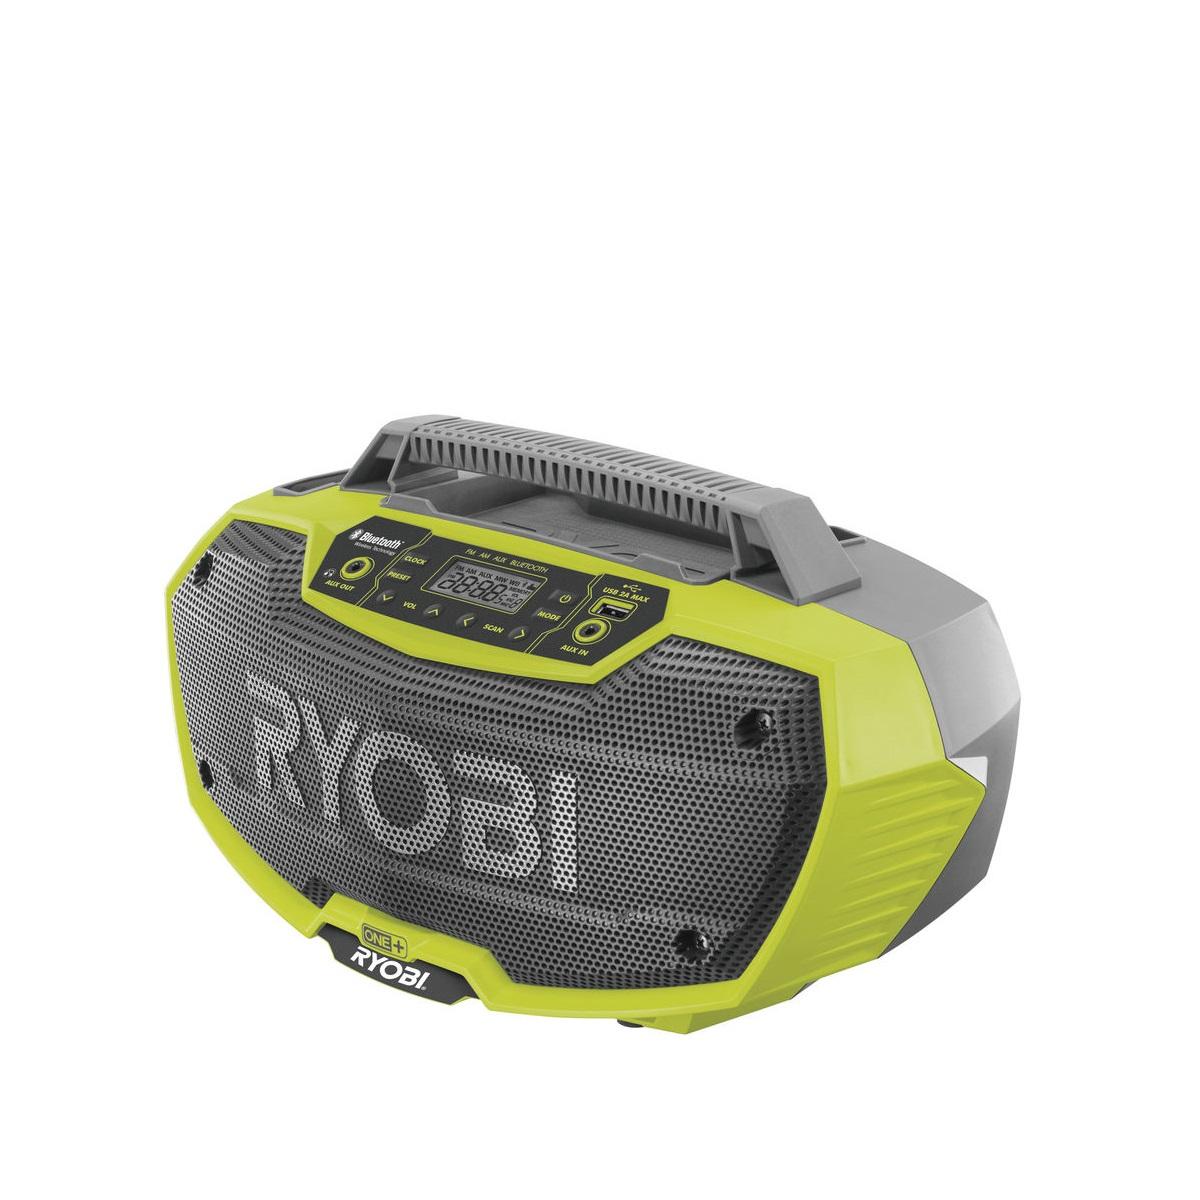 Ryobi R18RH-0